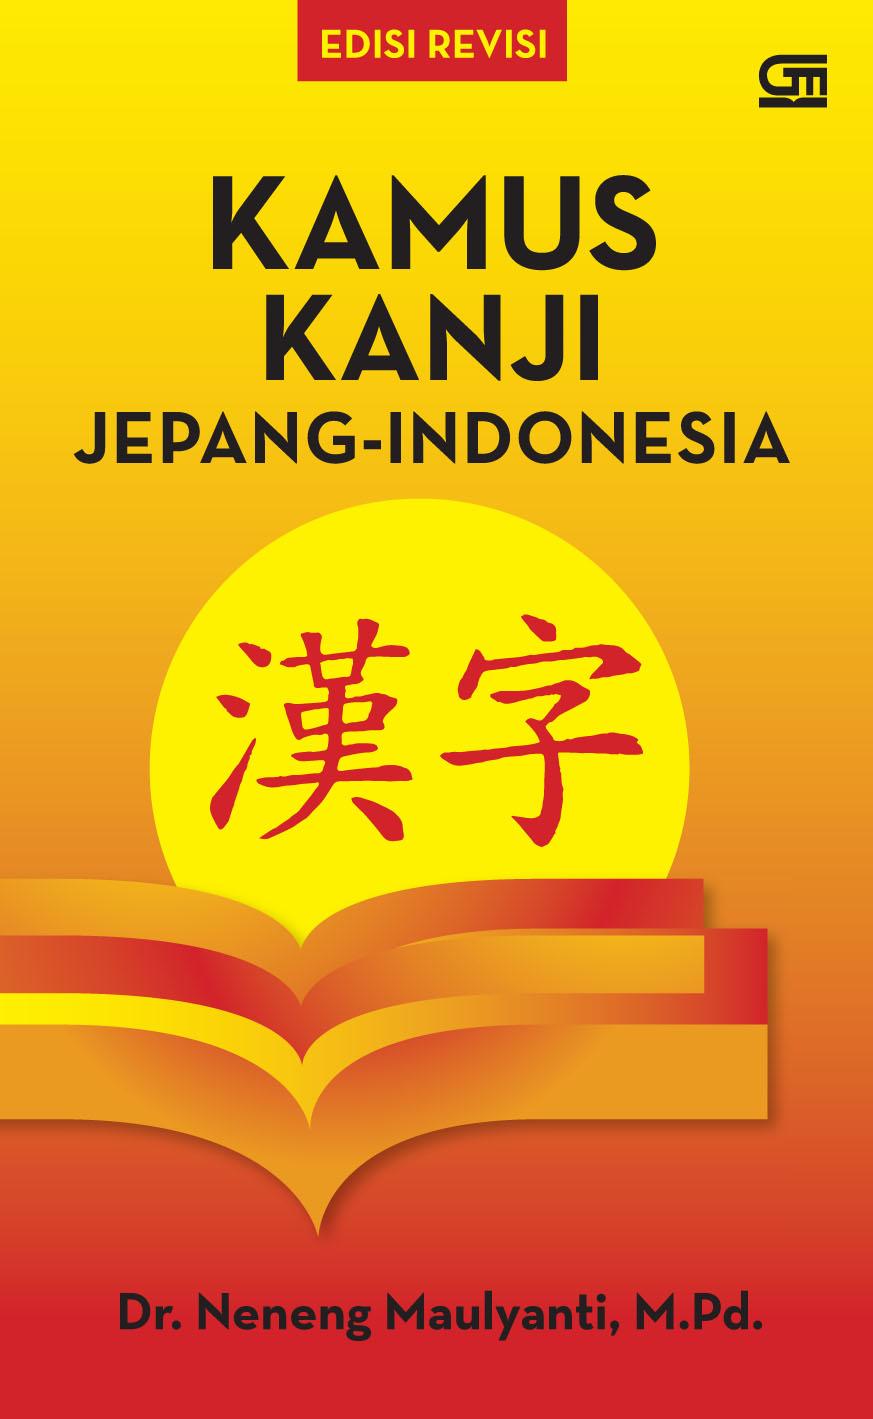 Kamus Kanji Jepang - Indonesia (Ed. Revisi)